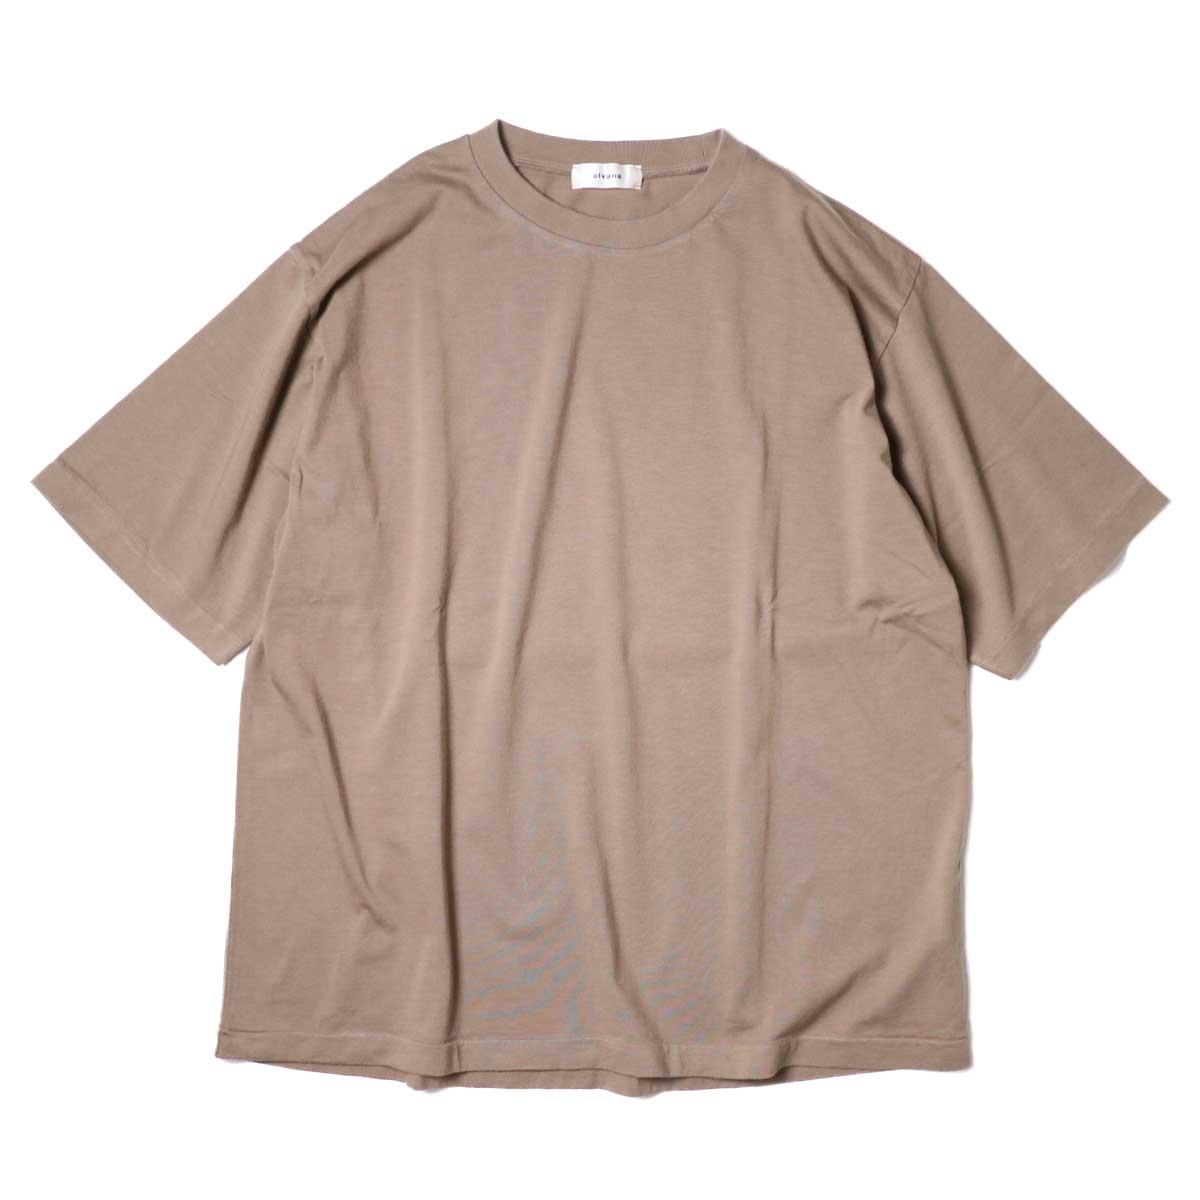 alvana / Dairy Oversize Tee Shirts (Sunset Beige)